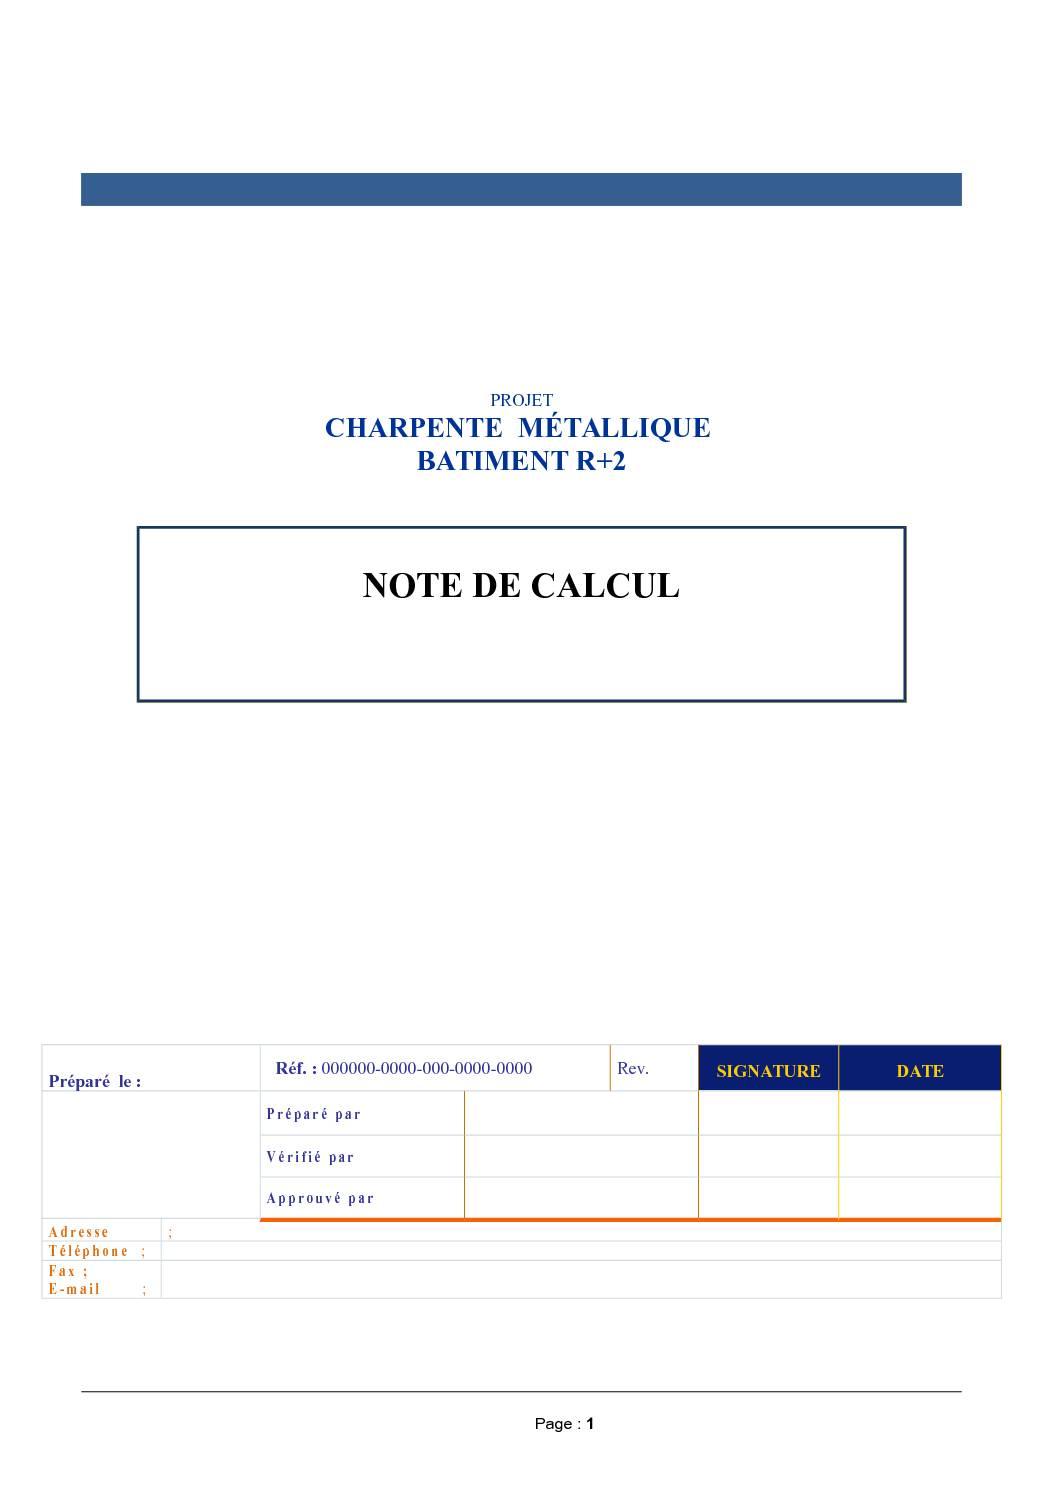 Note de Calcul Charpente Metallique